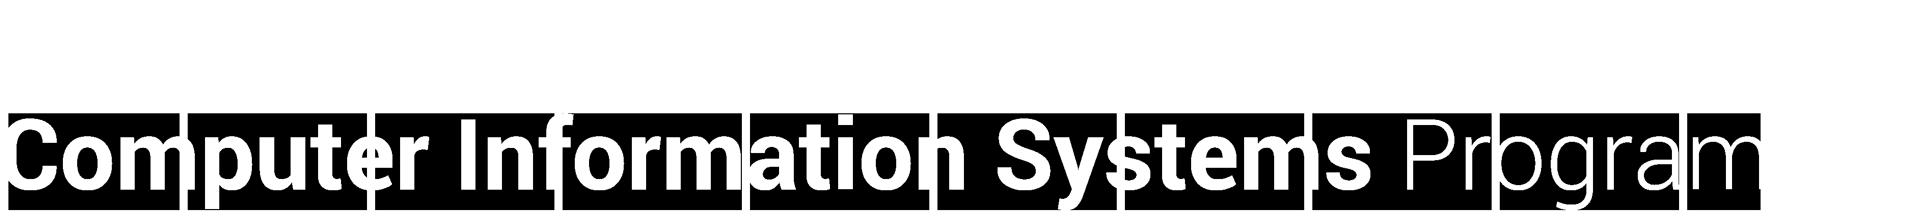 Computer Information Systems Program